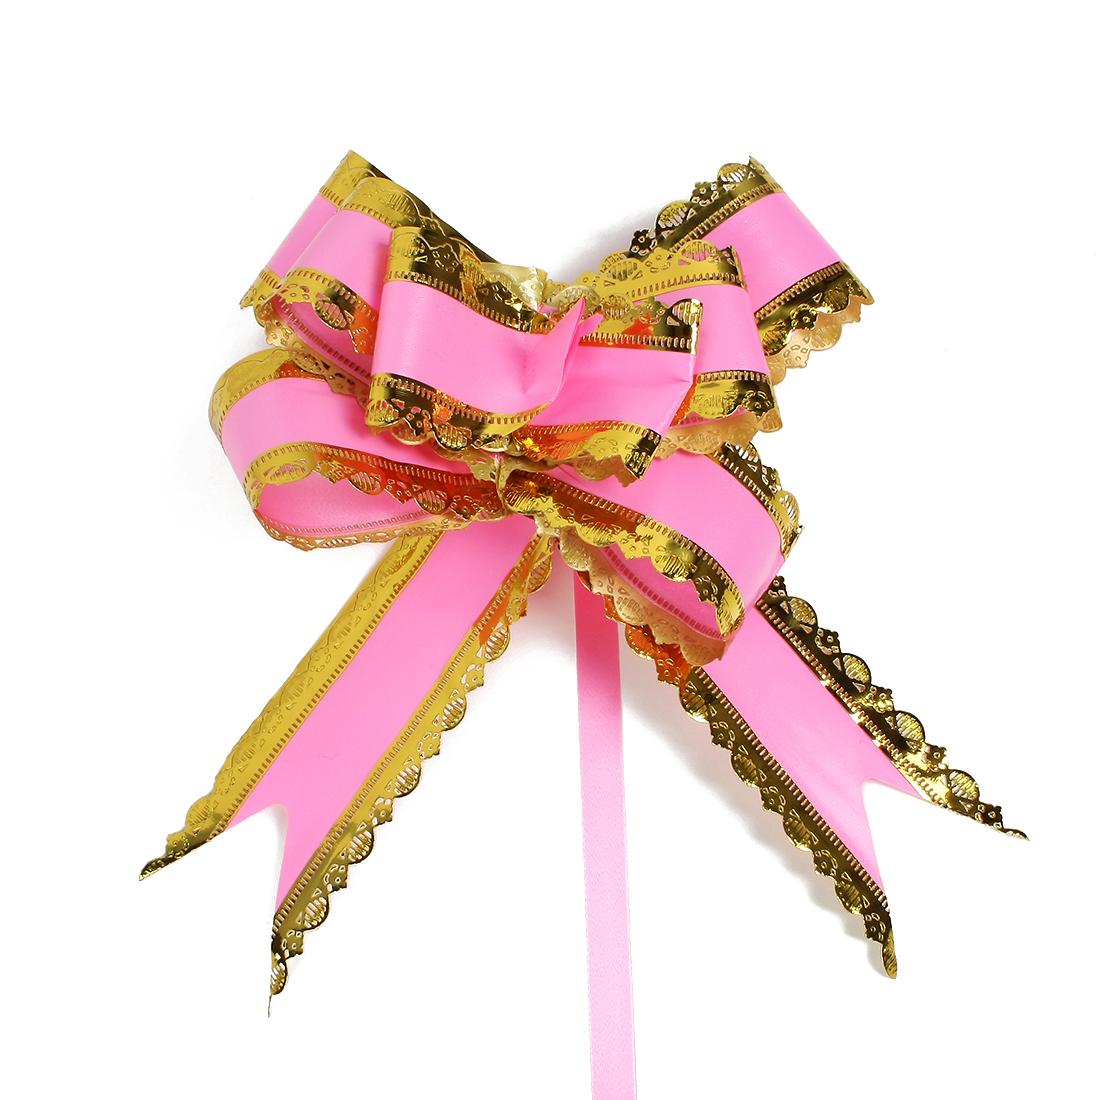 Wedding Bridal Party Gift Box Ribbon Pull Bows Decoration Pink 5cm Width 10pcs